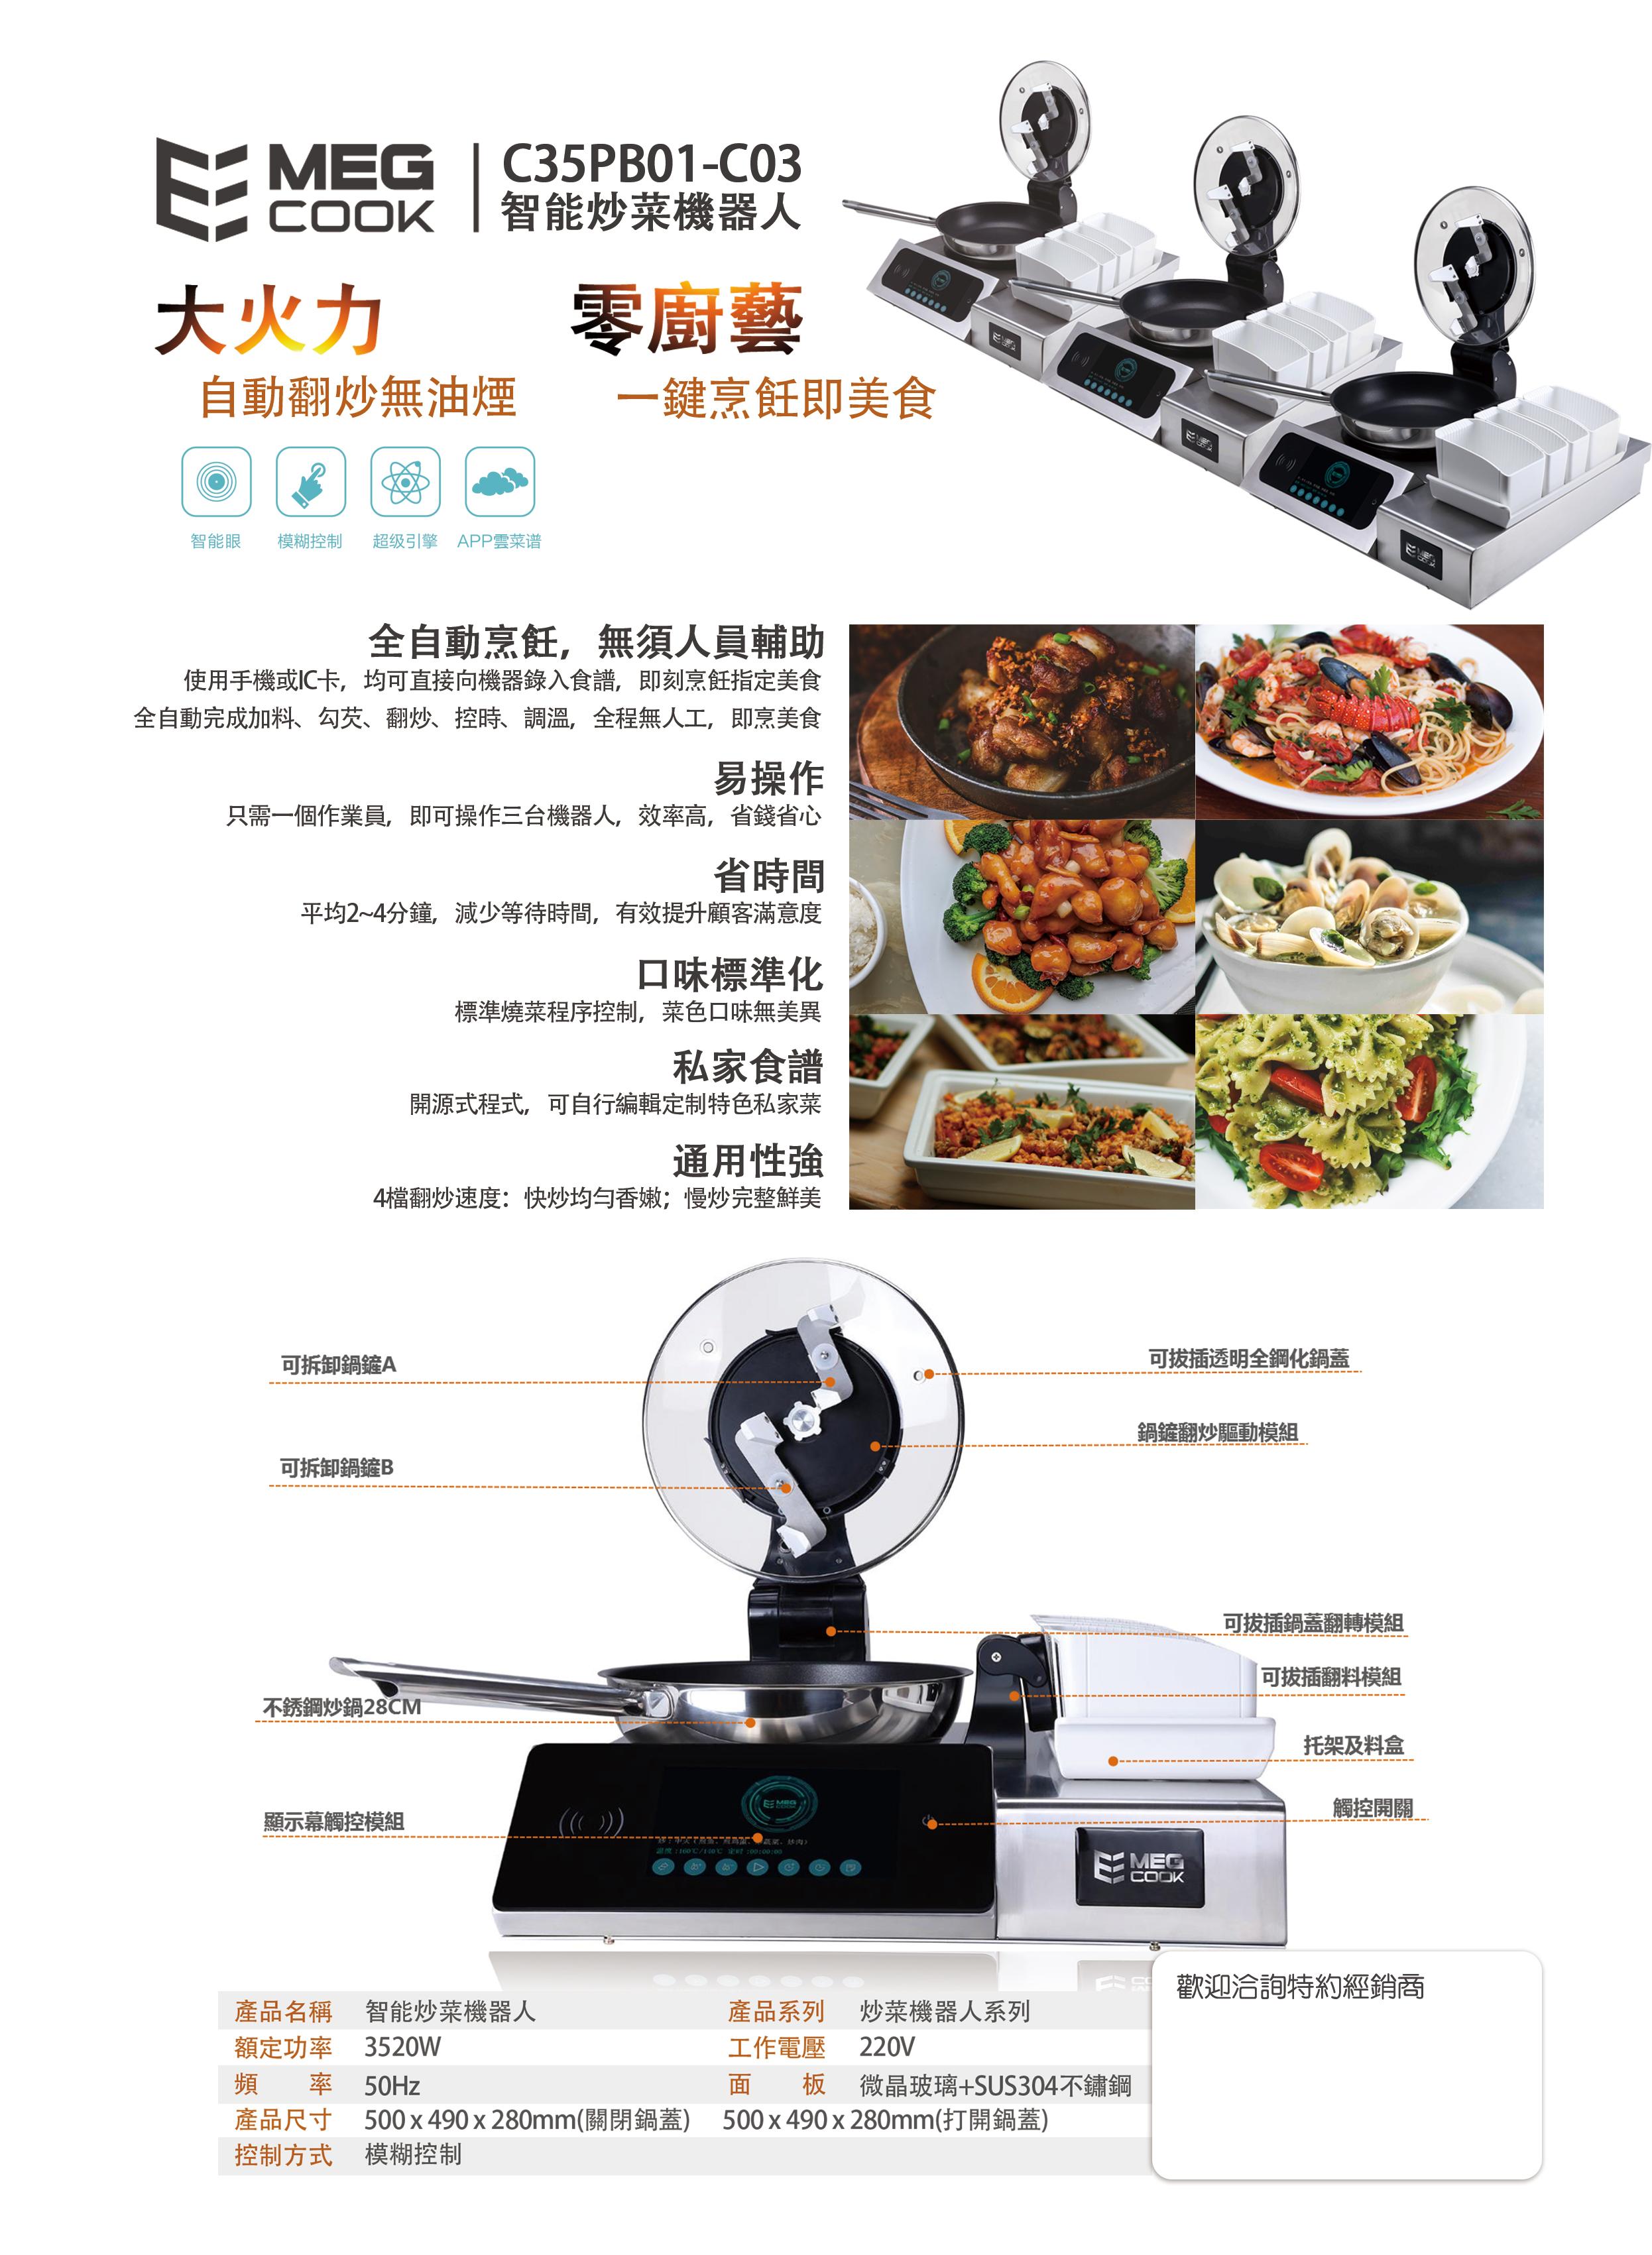 C35PB01-C03 智能炒菜機器人